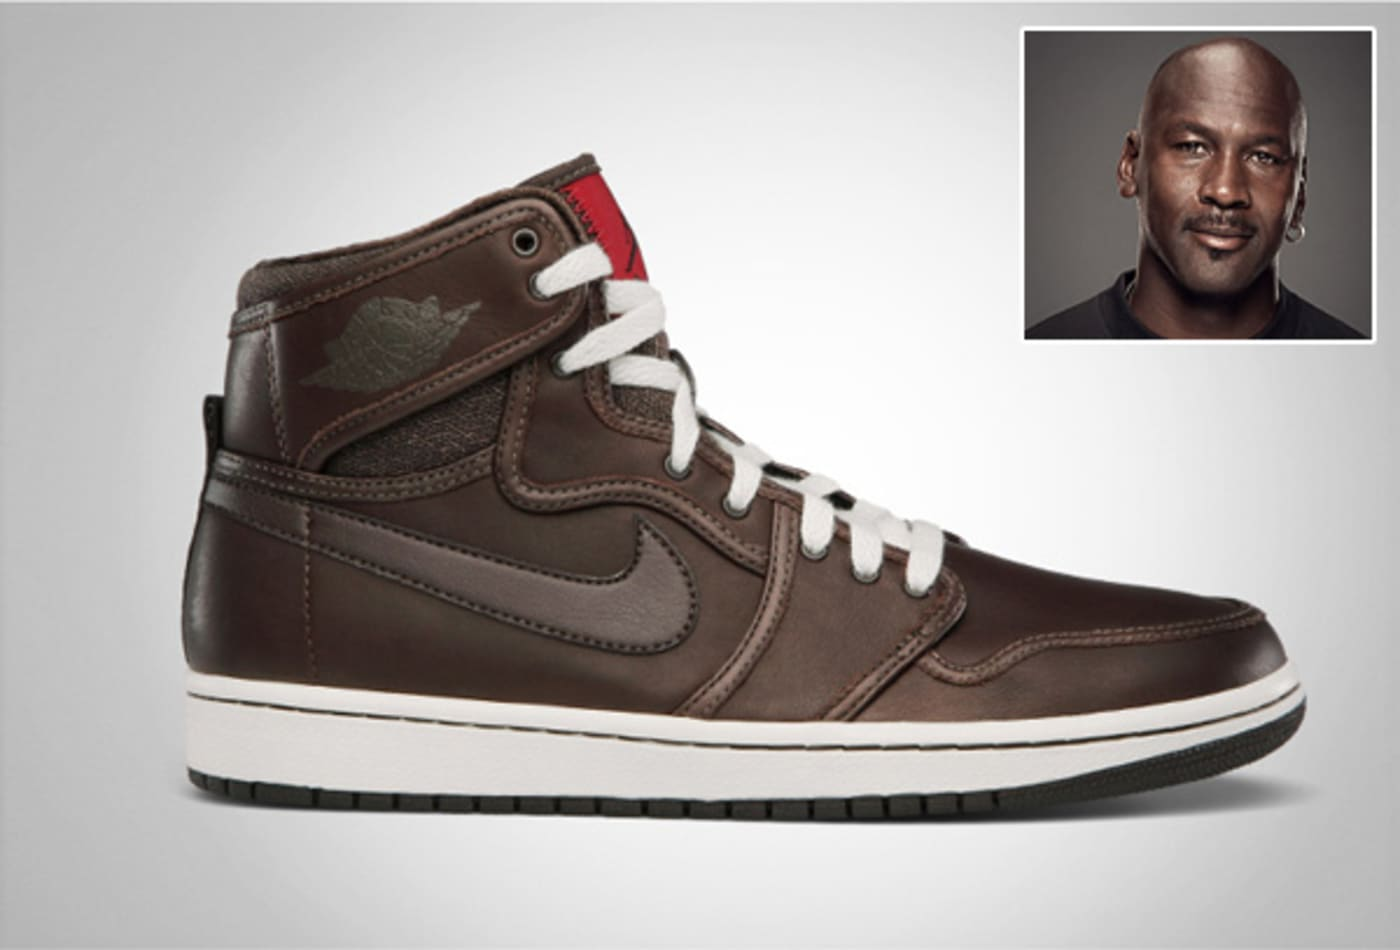 Michael-Jordan-Air-Athlete-Clothing-Lines-CNBC.jpg